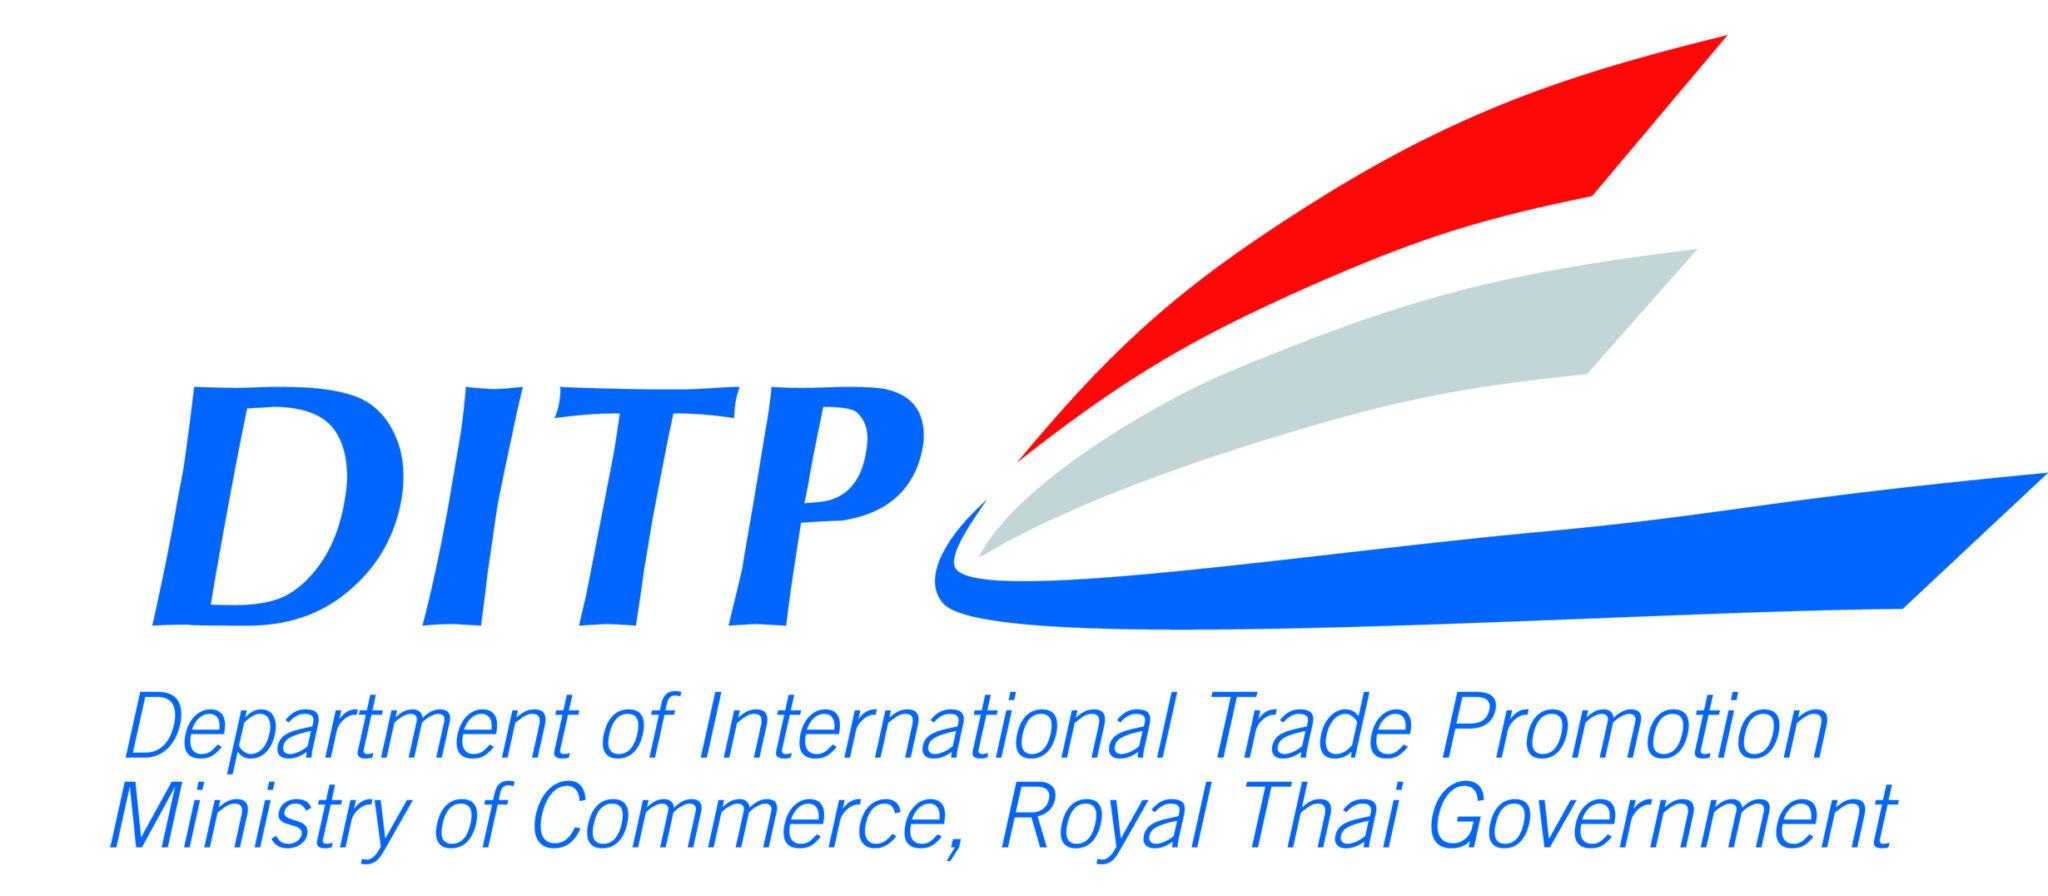 DITP Royal Thai Government